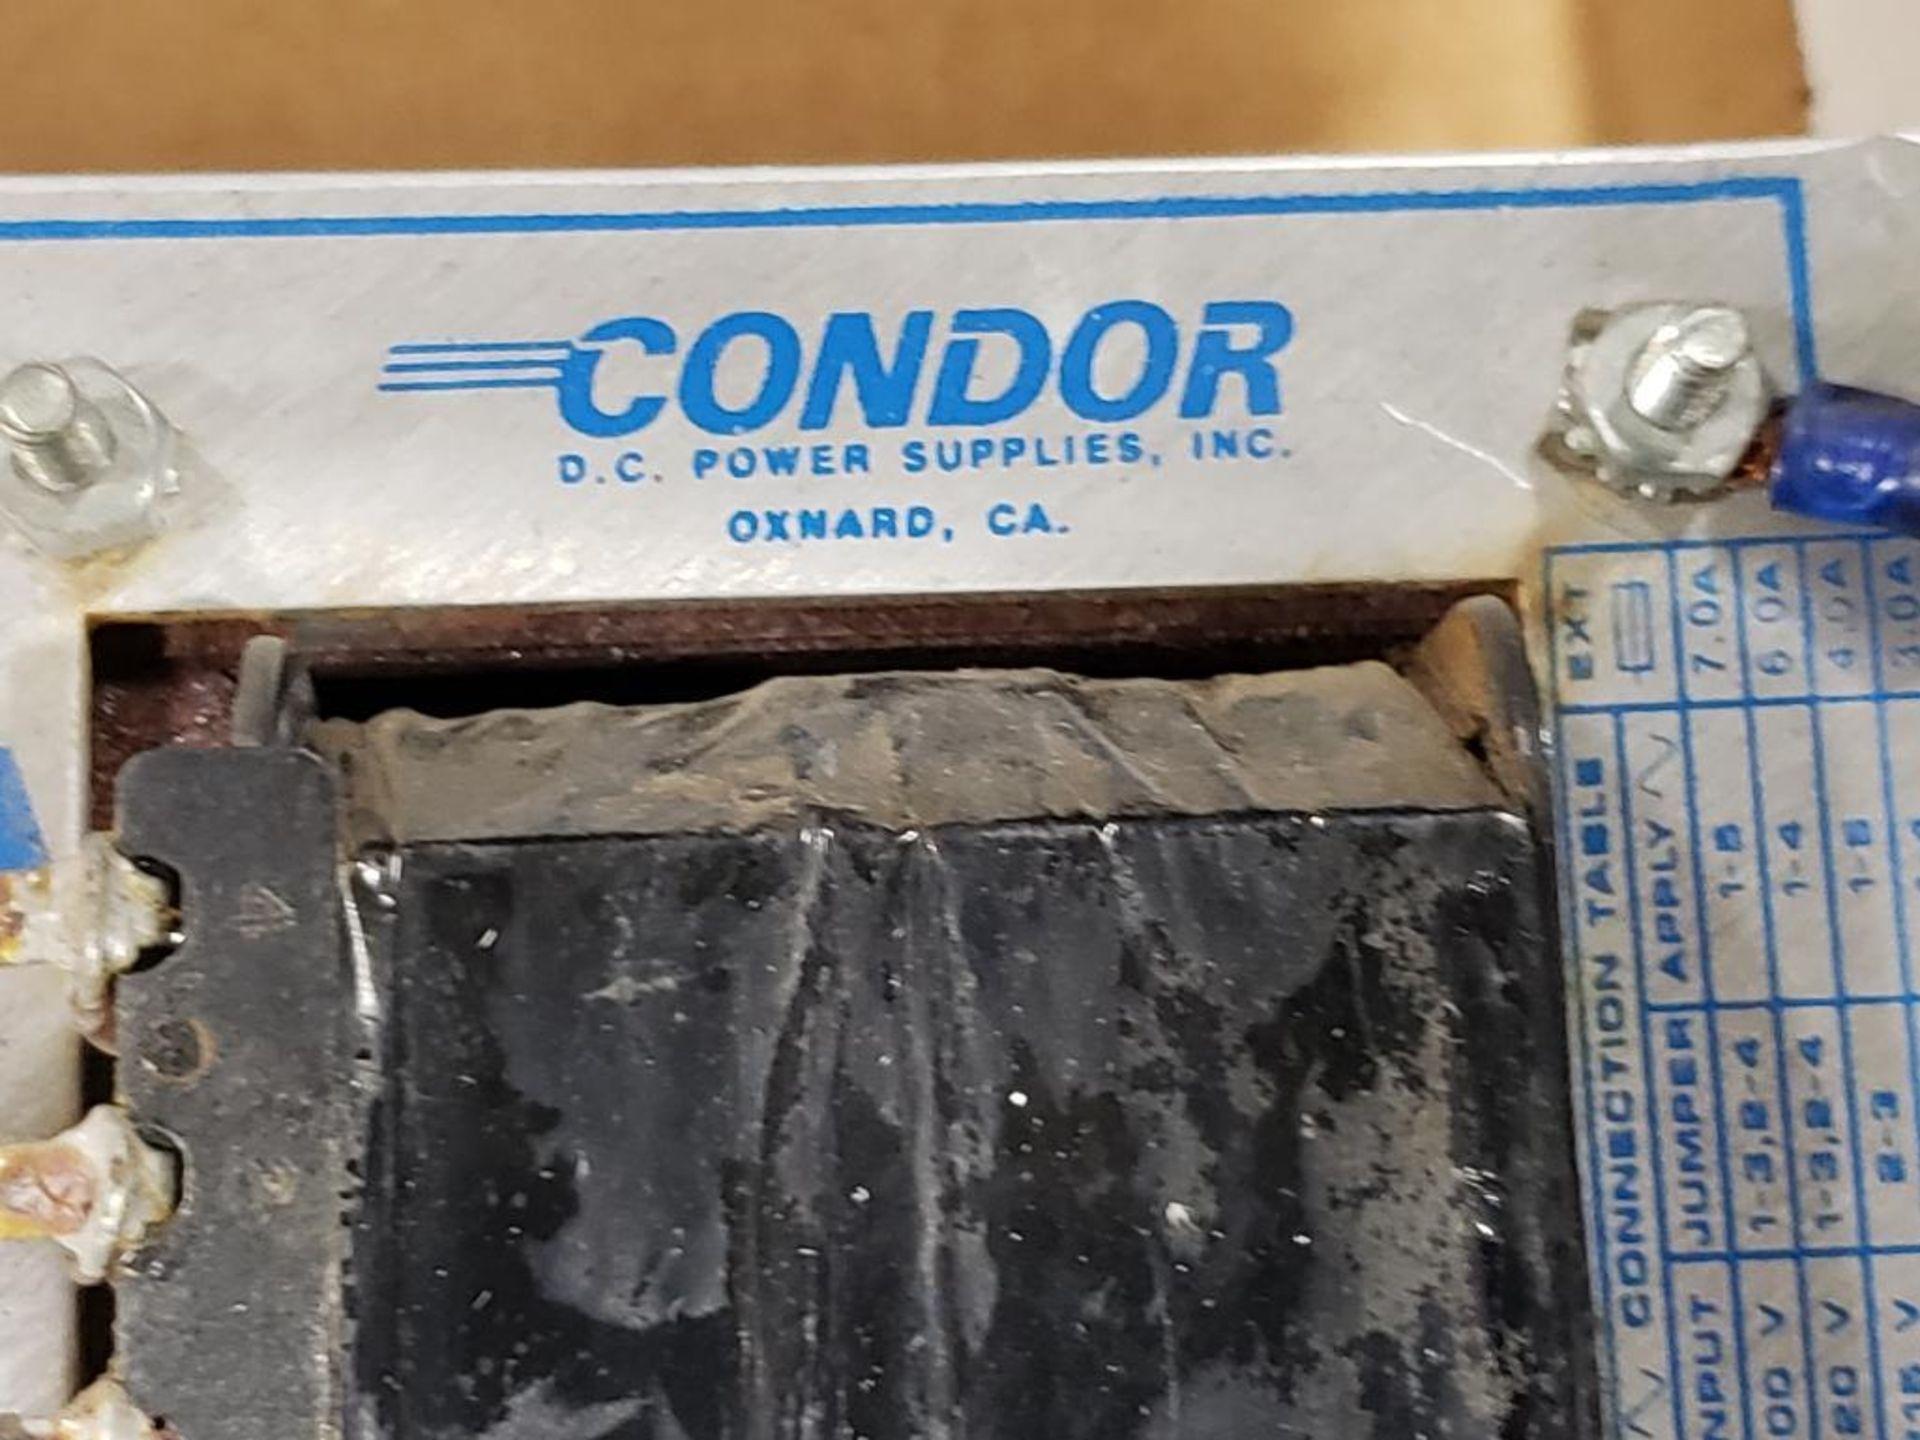 Condor F24-12-A+ Power supply. - Image 6 of 6